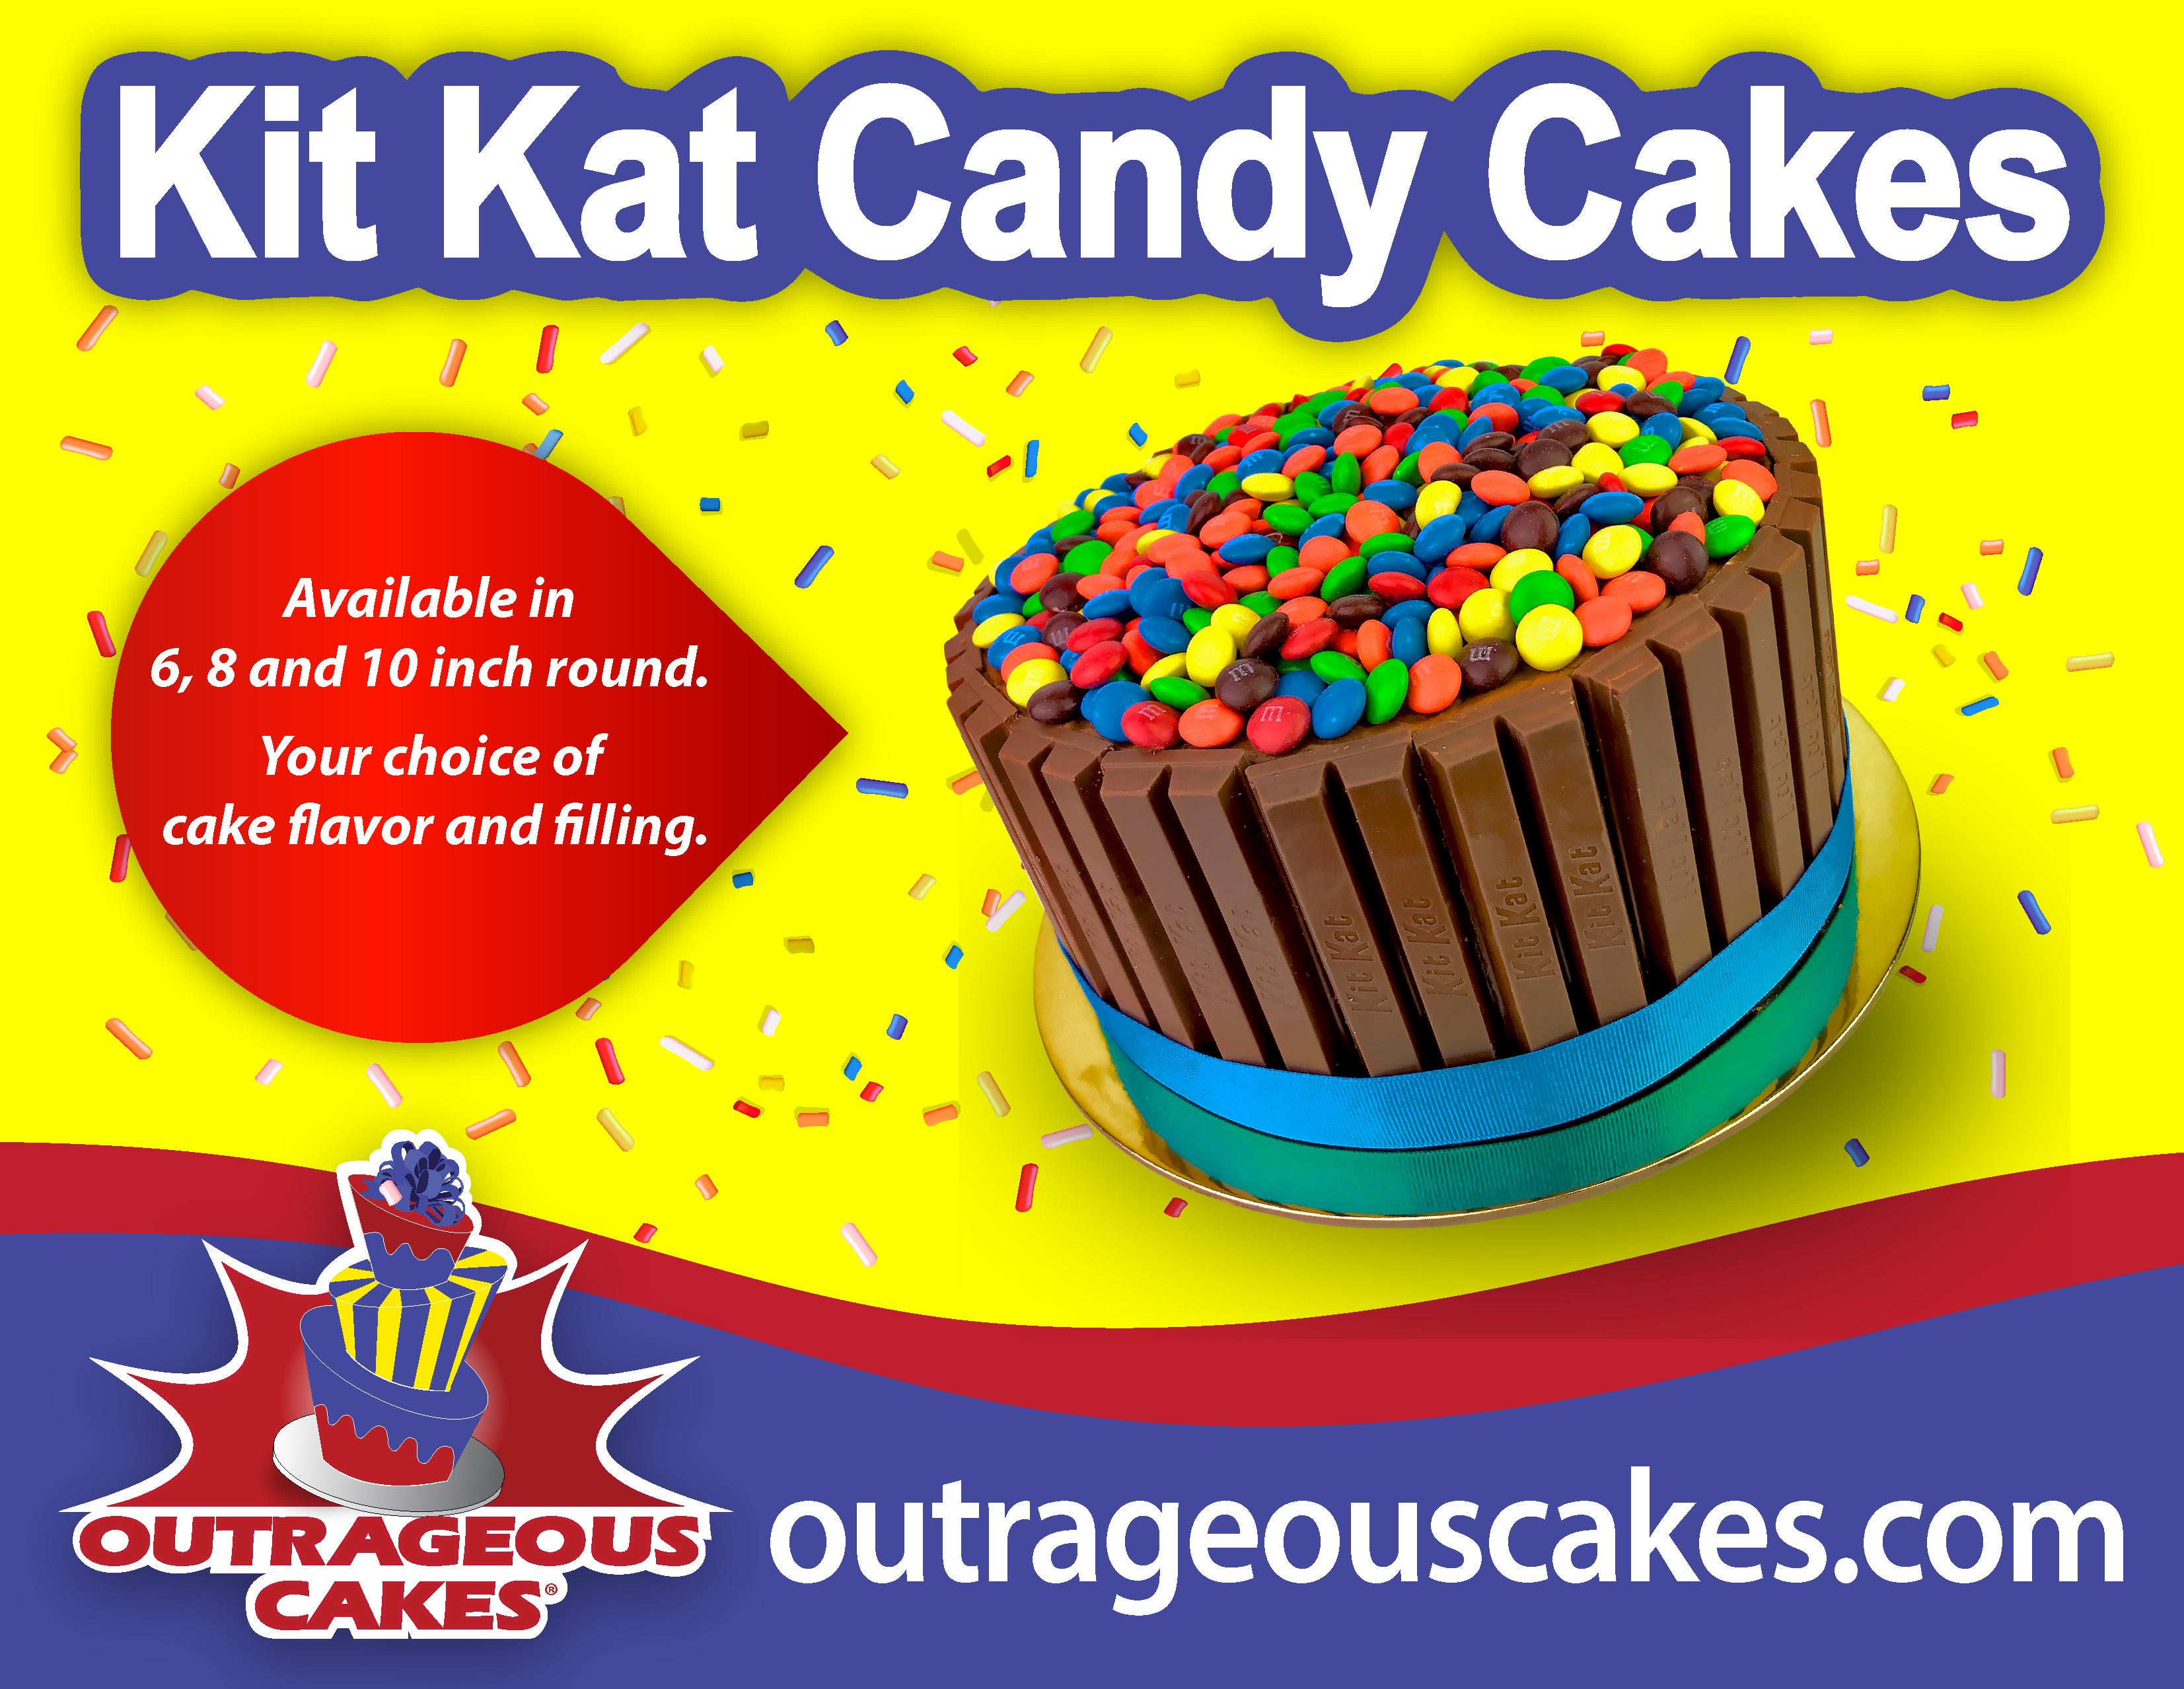 kit kat candy cakes